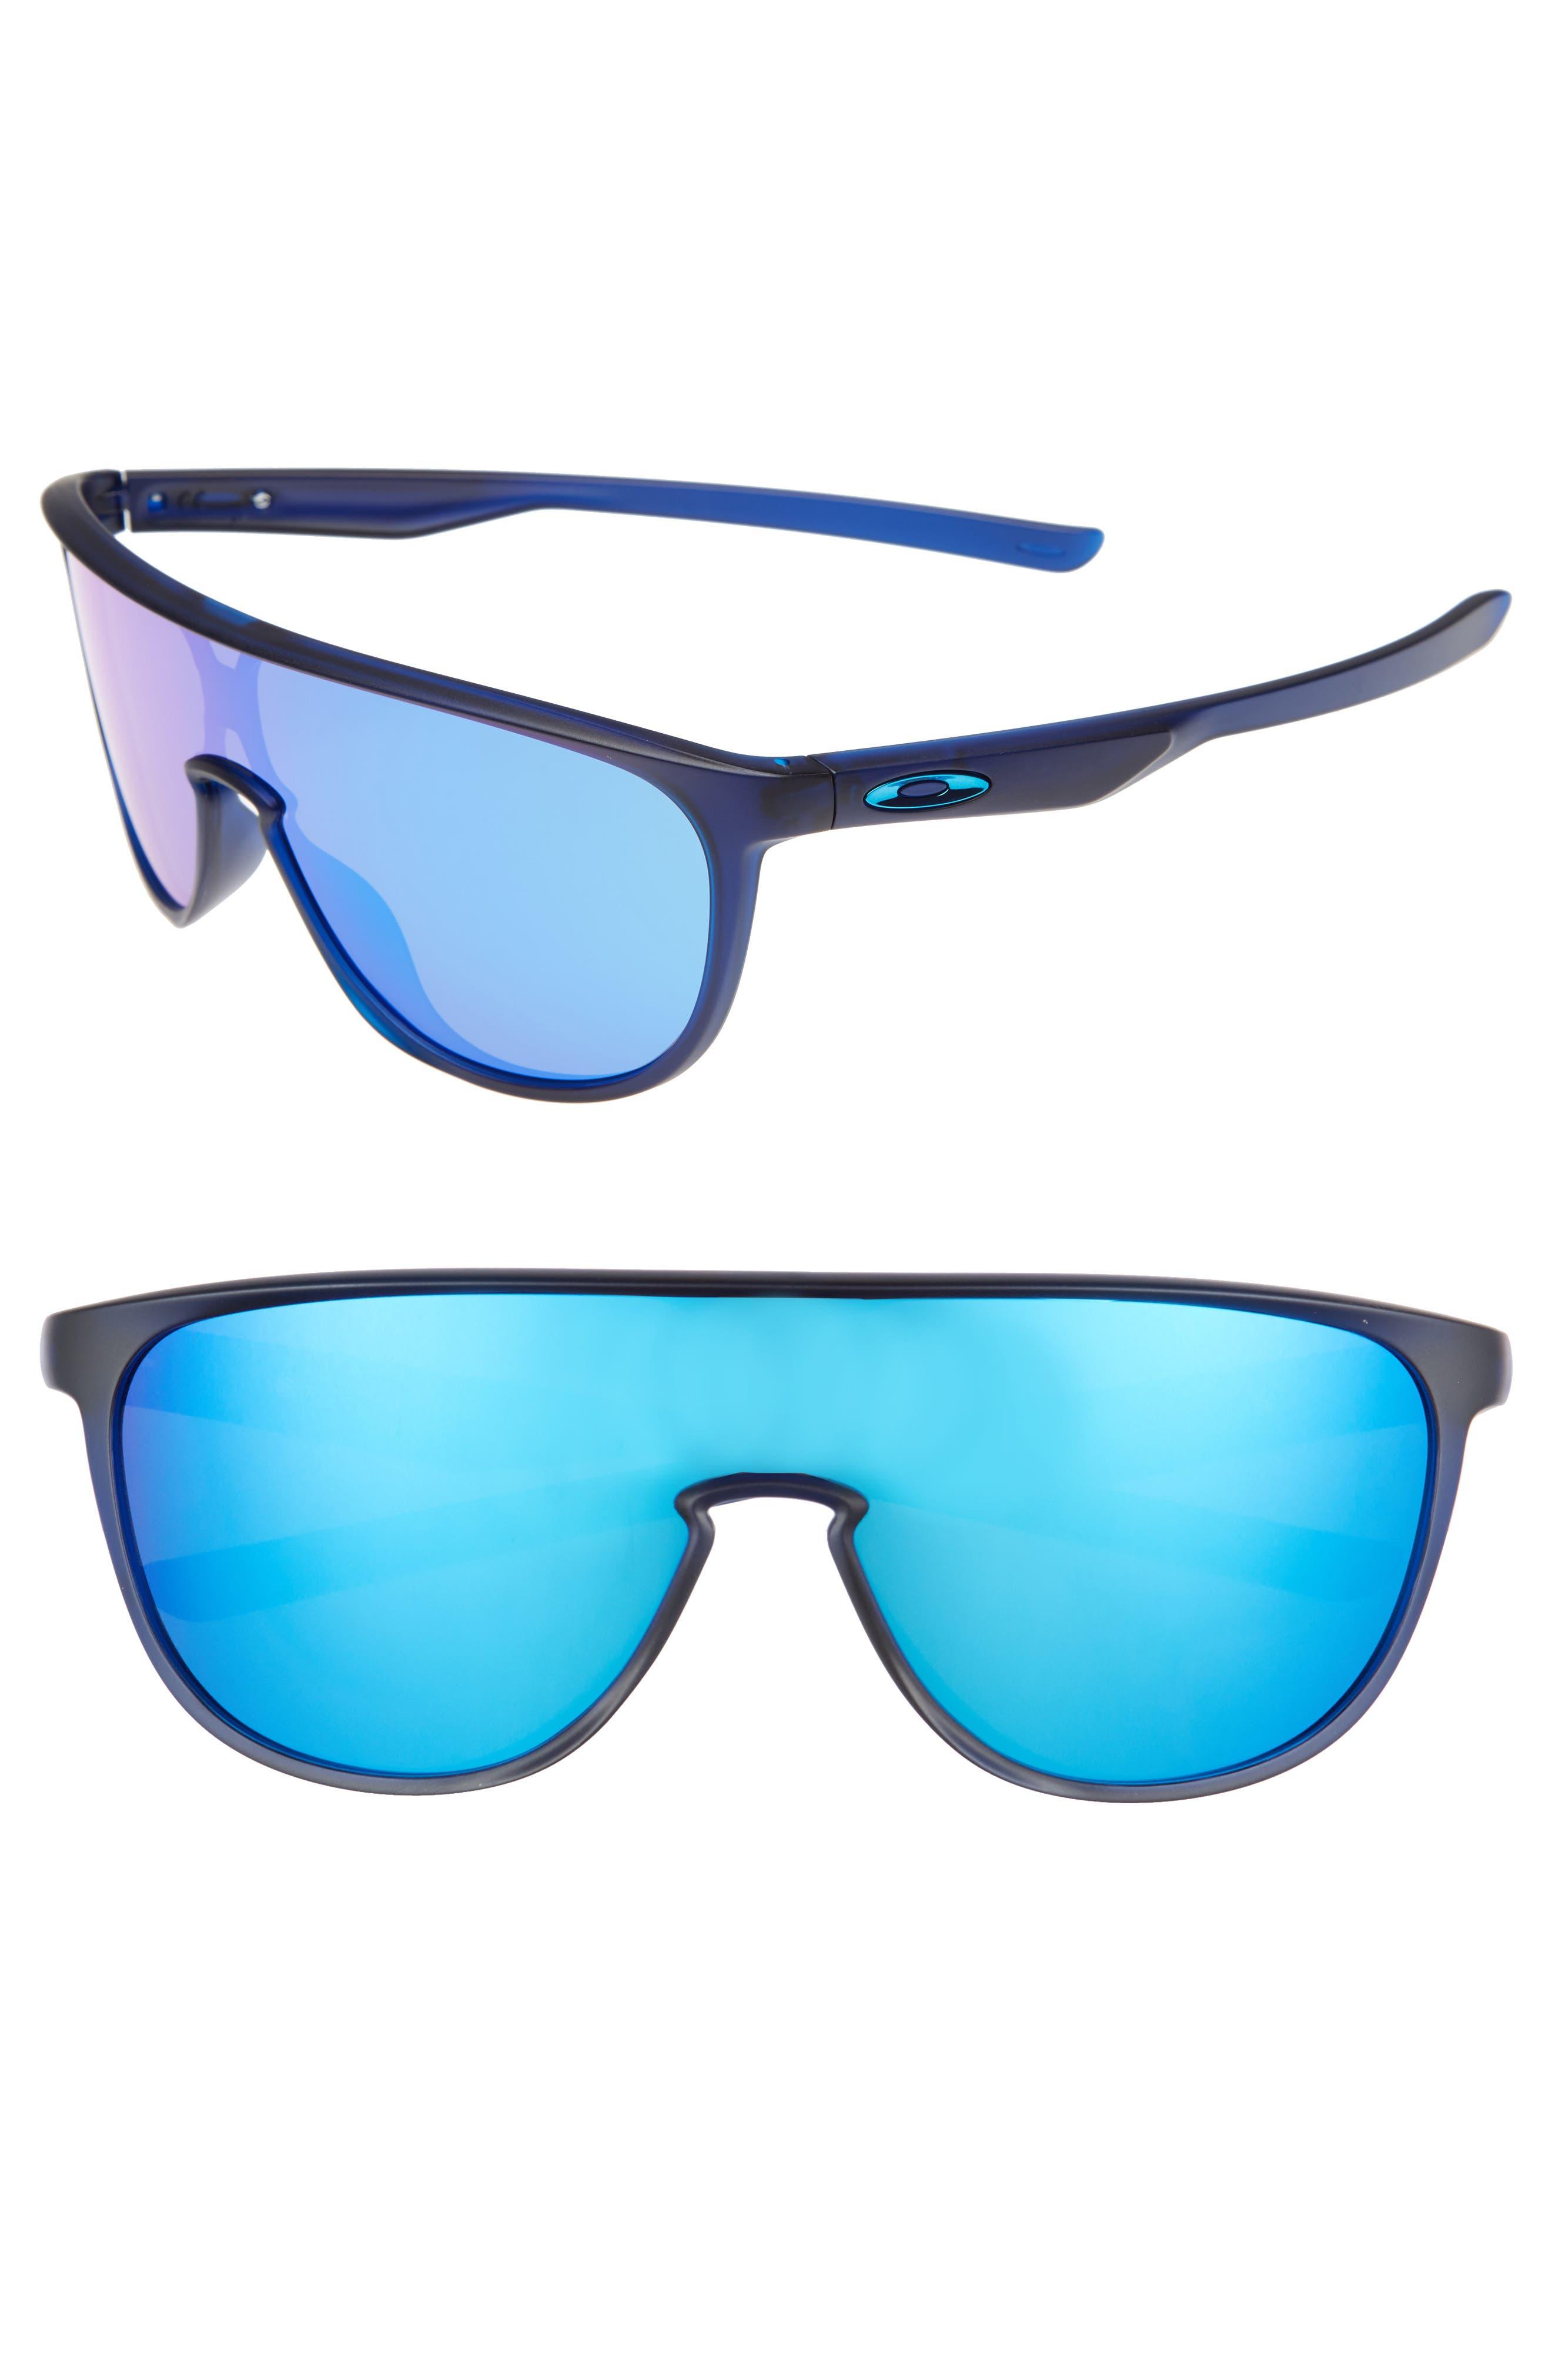 Oakley Trillbe 62mm Sunglasses